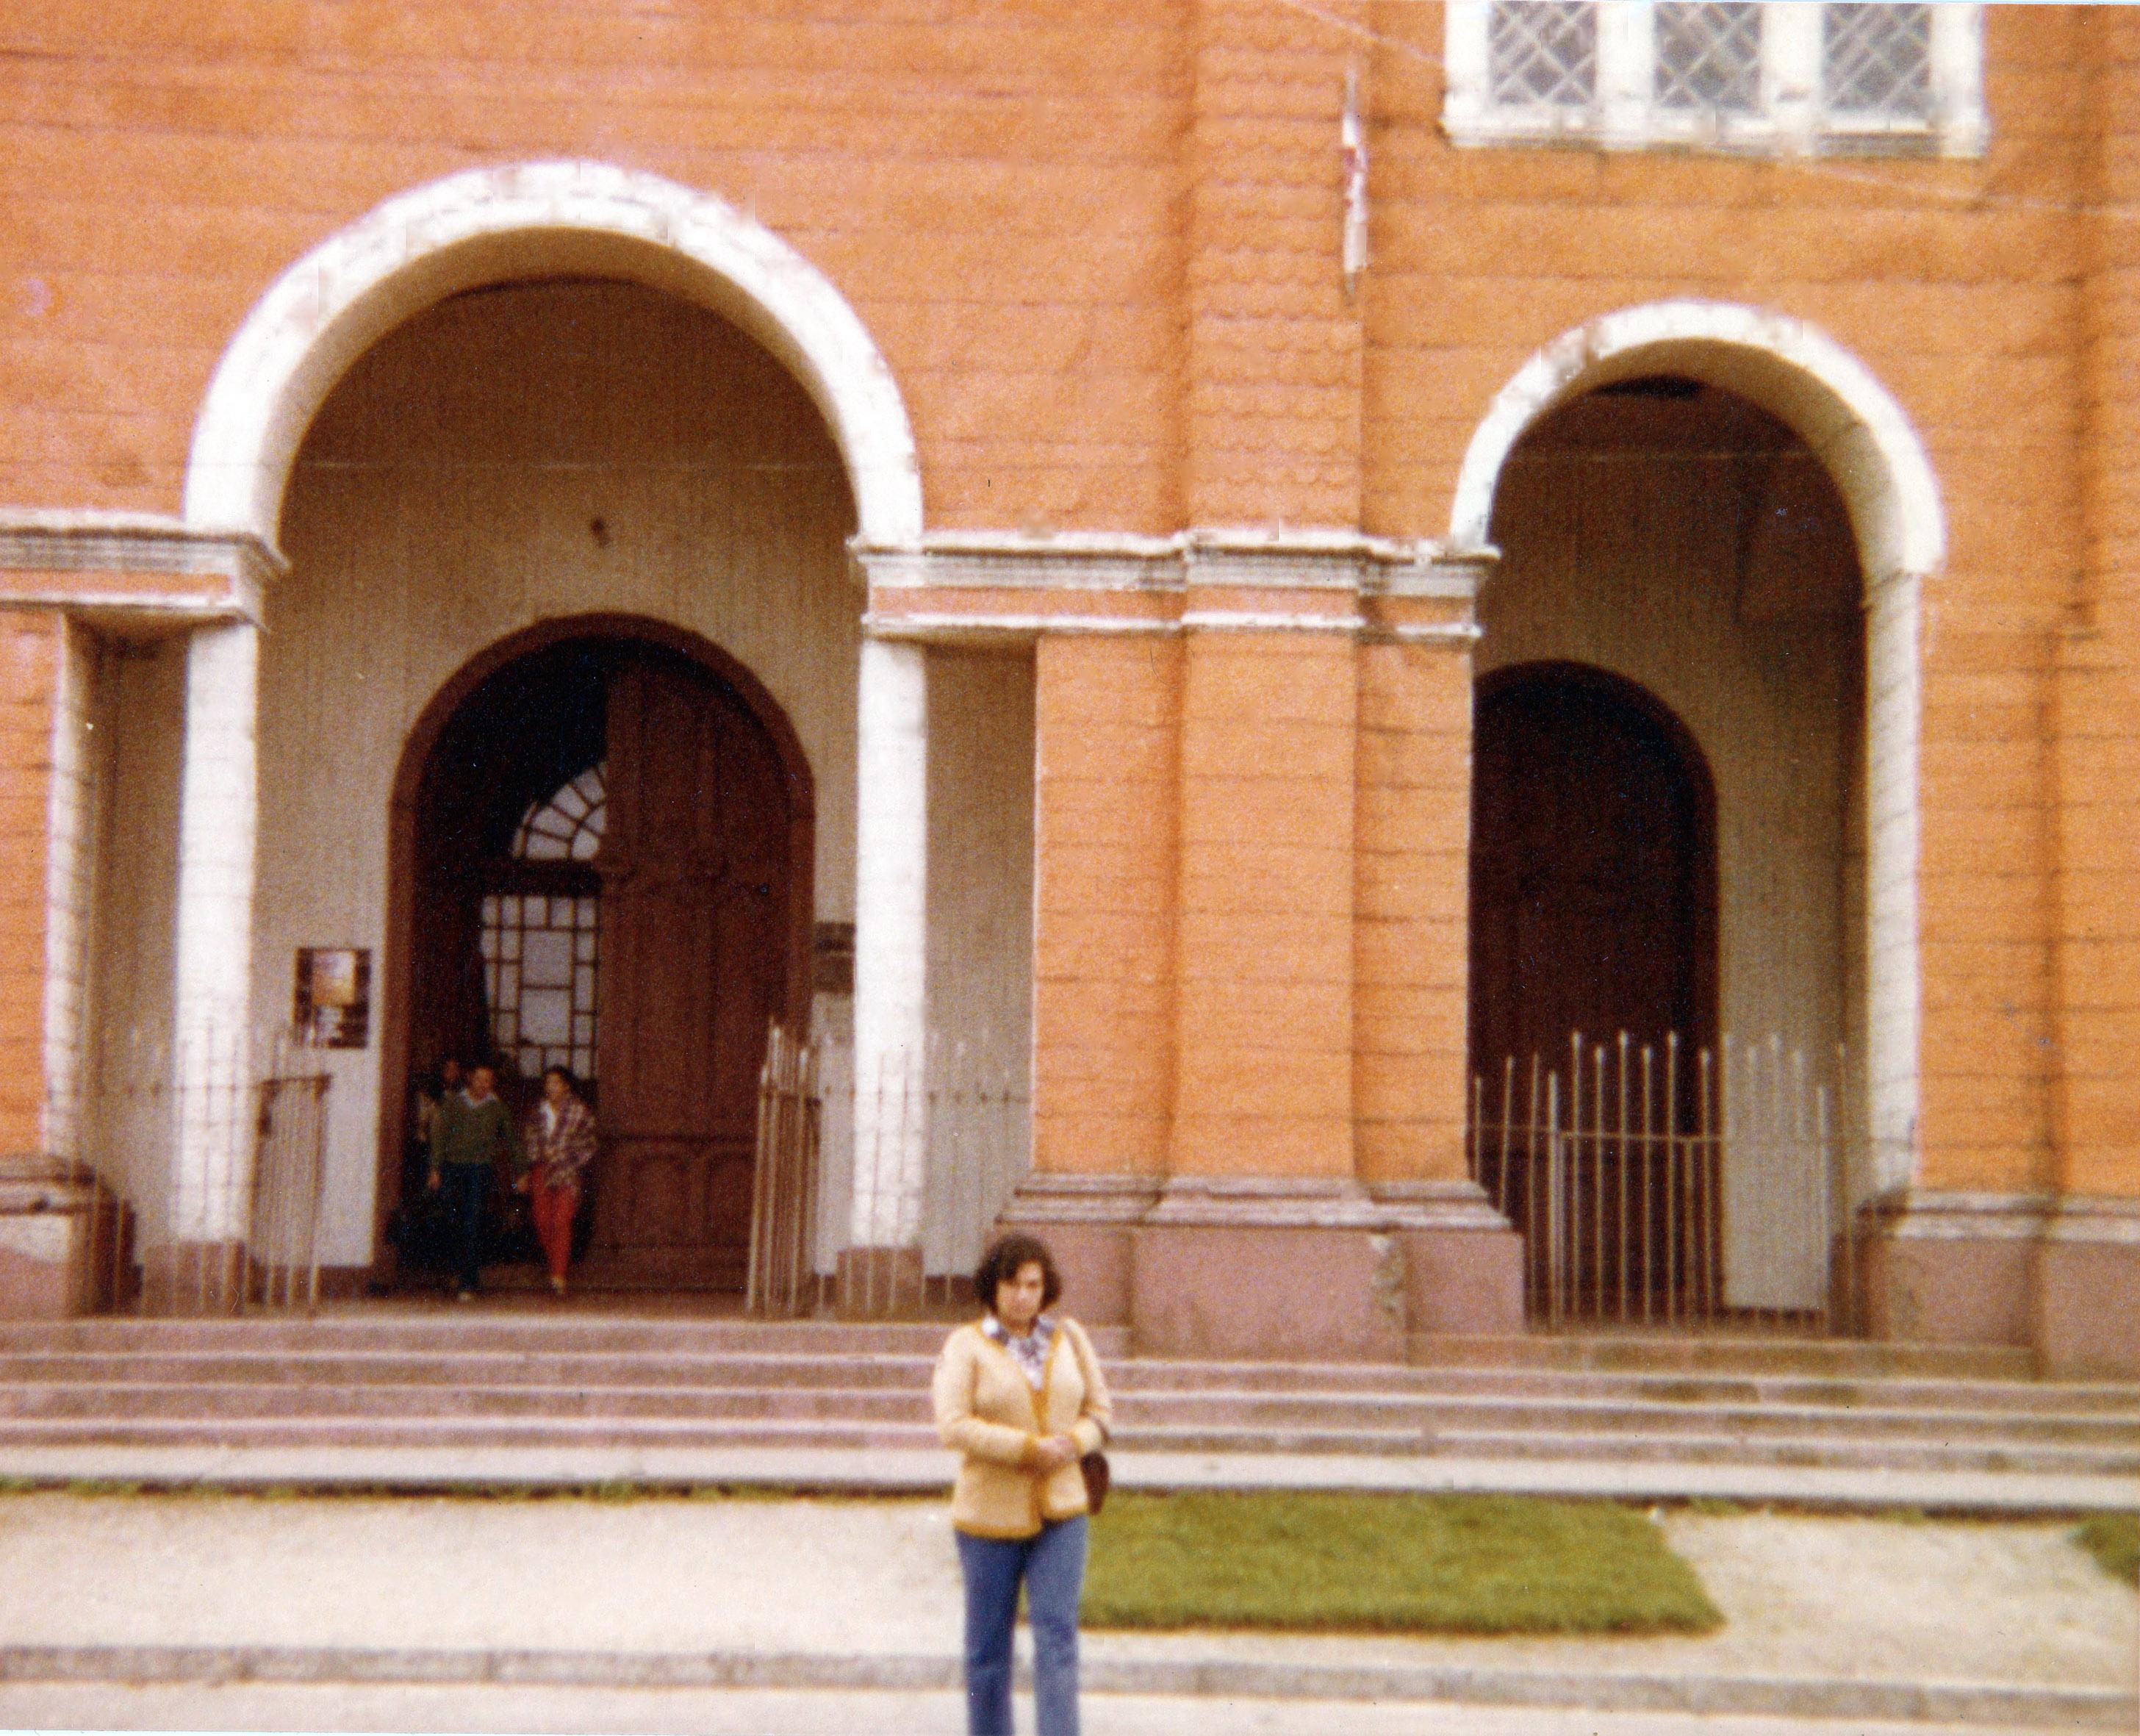 Enterreno - Fotos históricas de chile - fotos antiguas de Chile - Iglesia de Castro en 1980